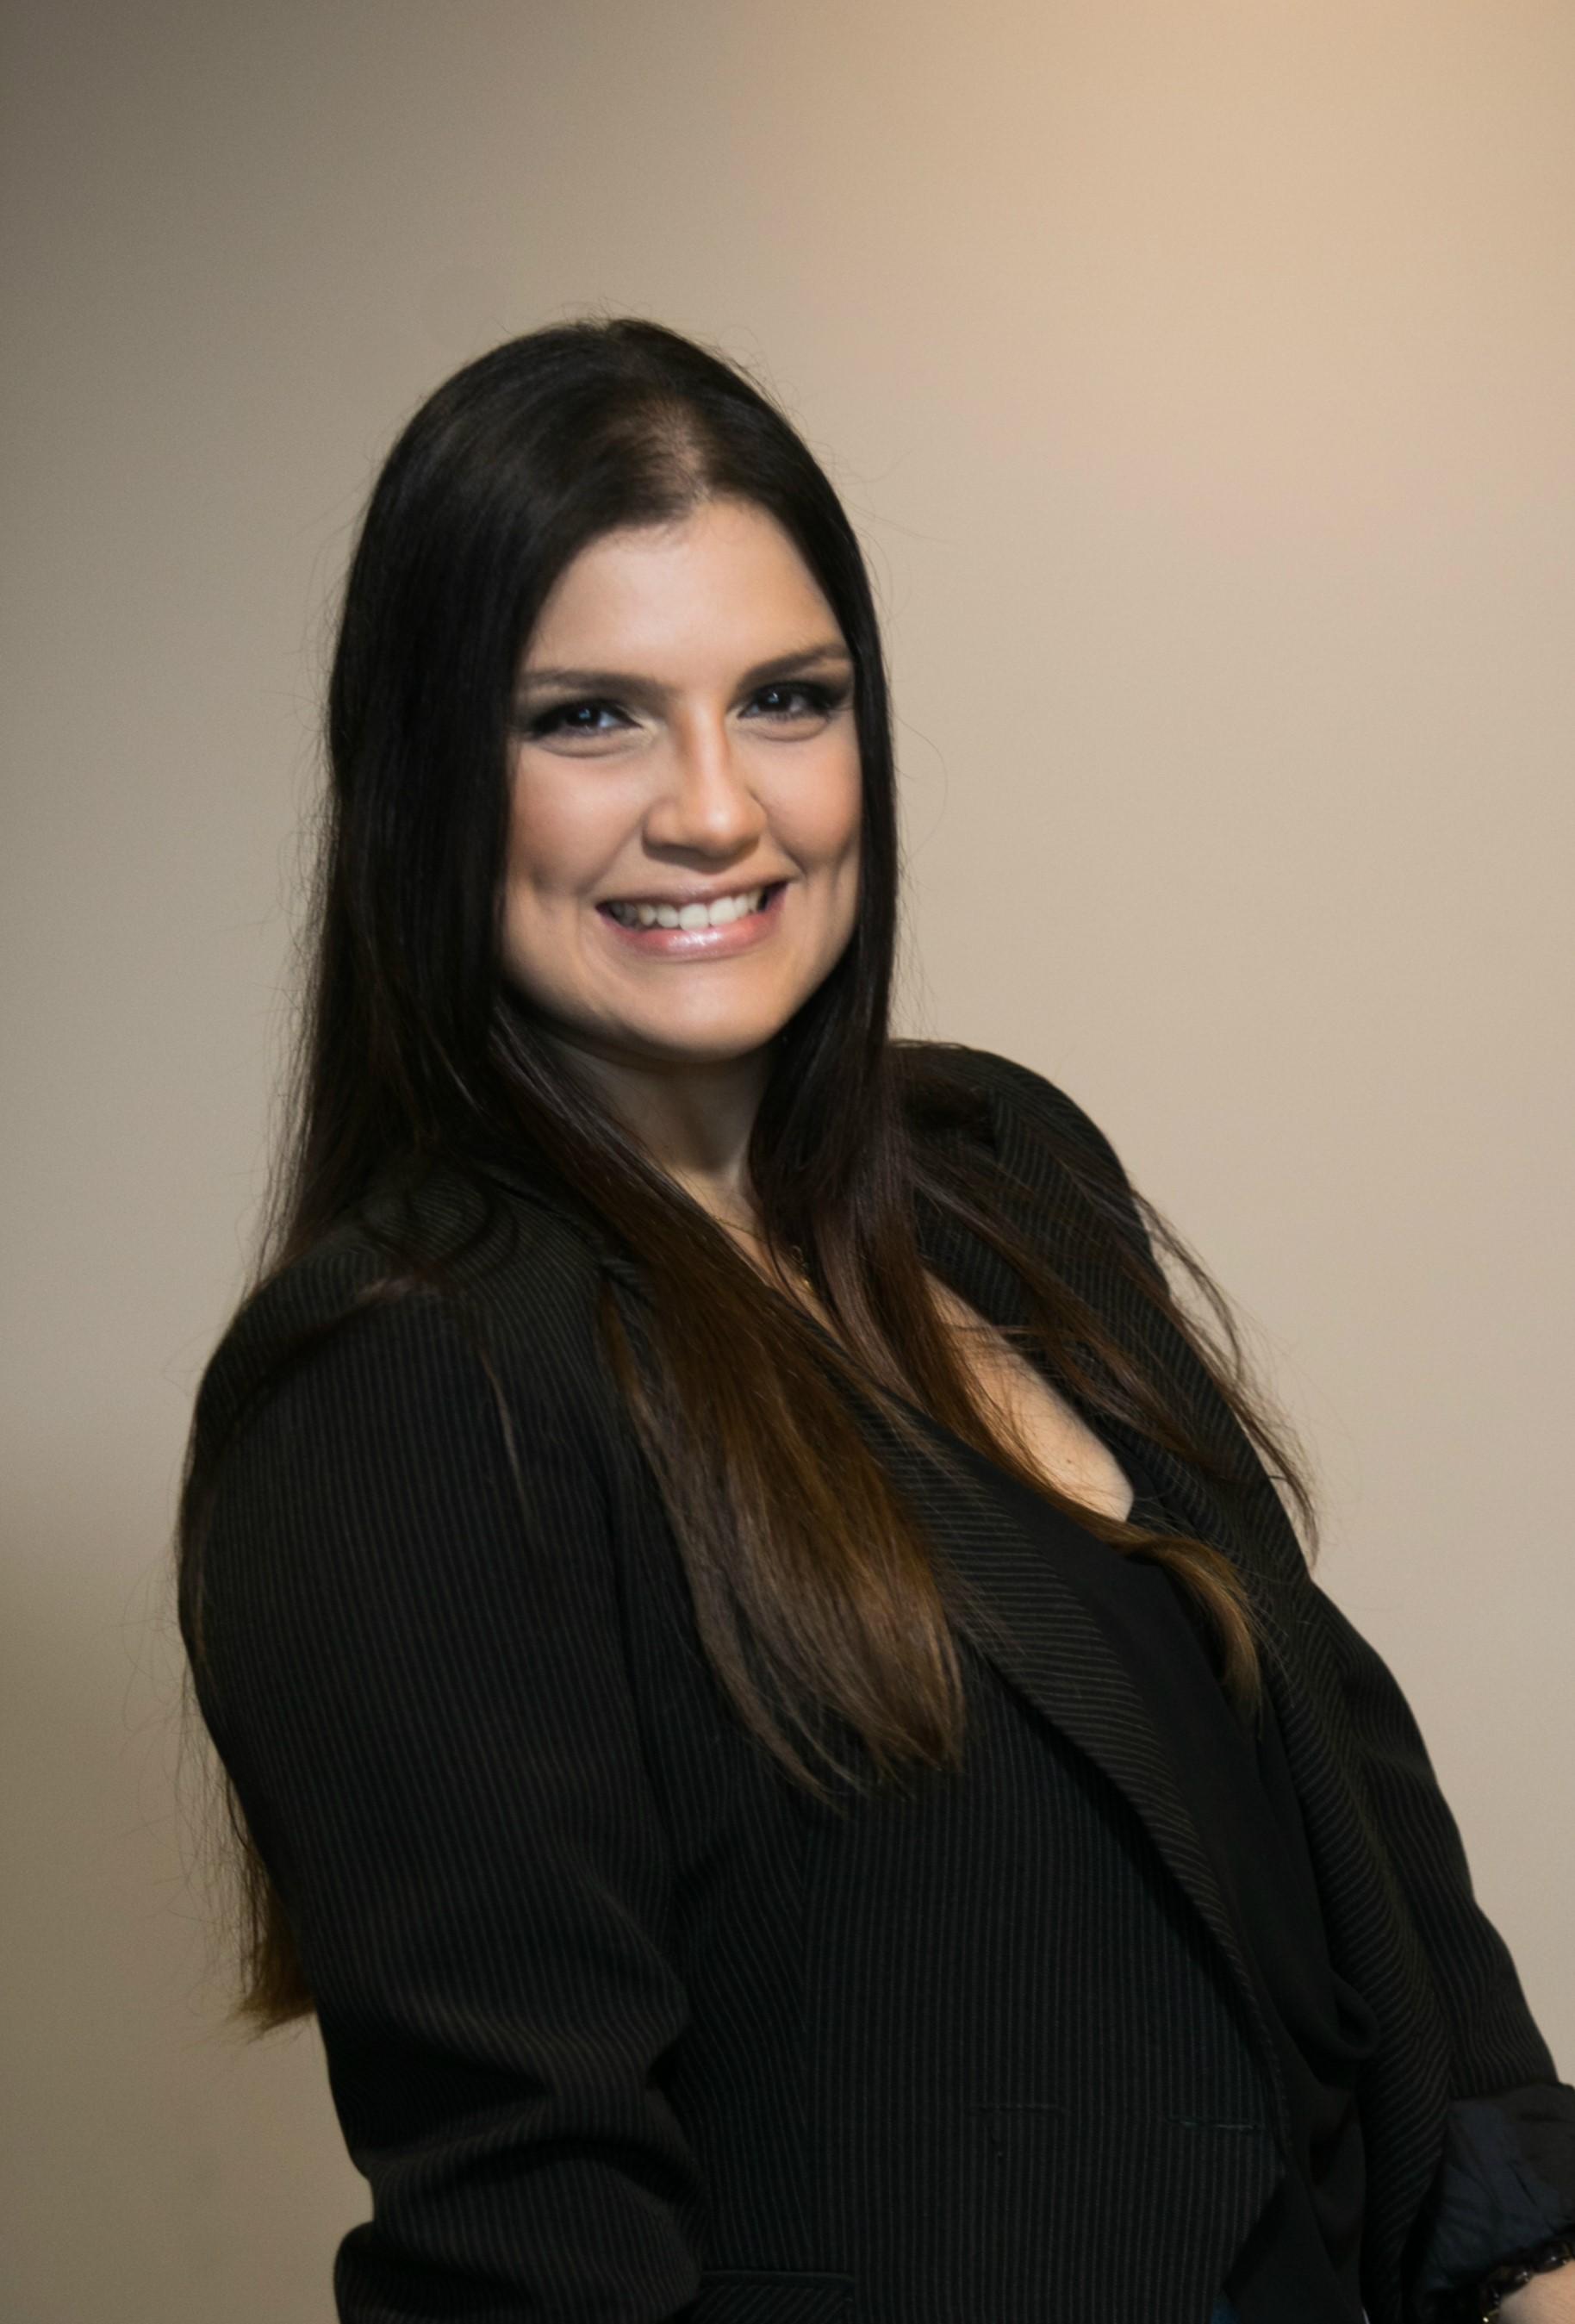 Mariana Tenório